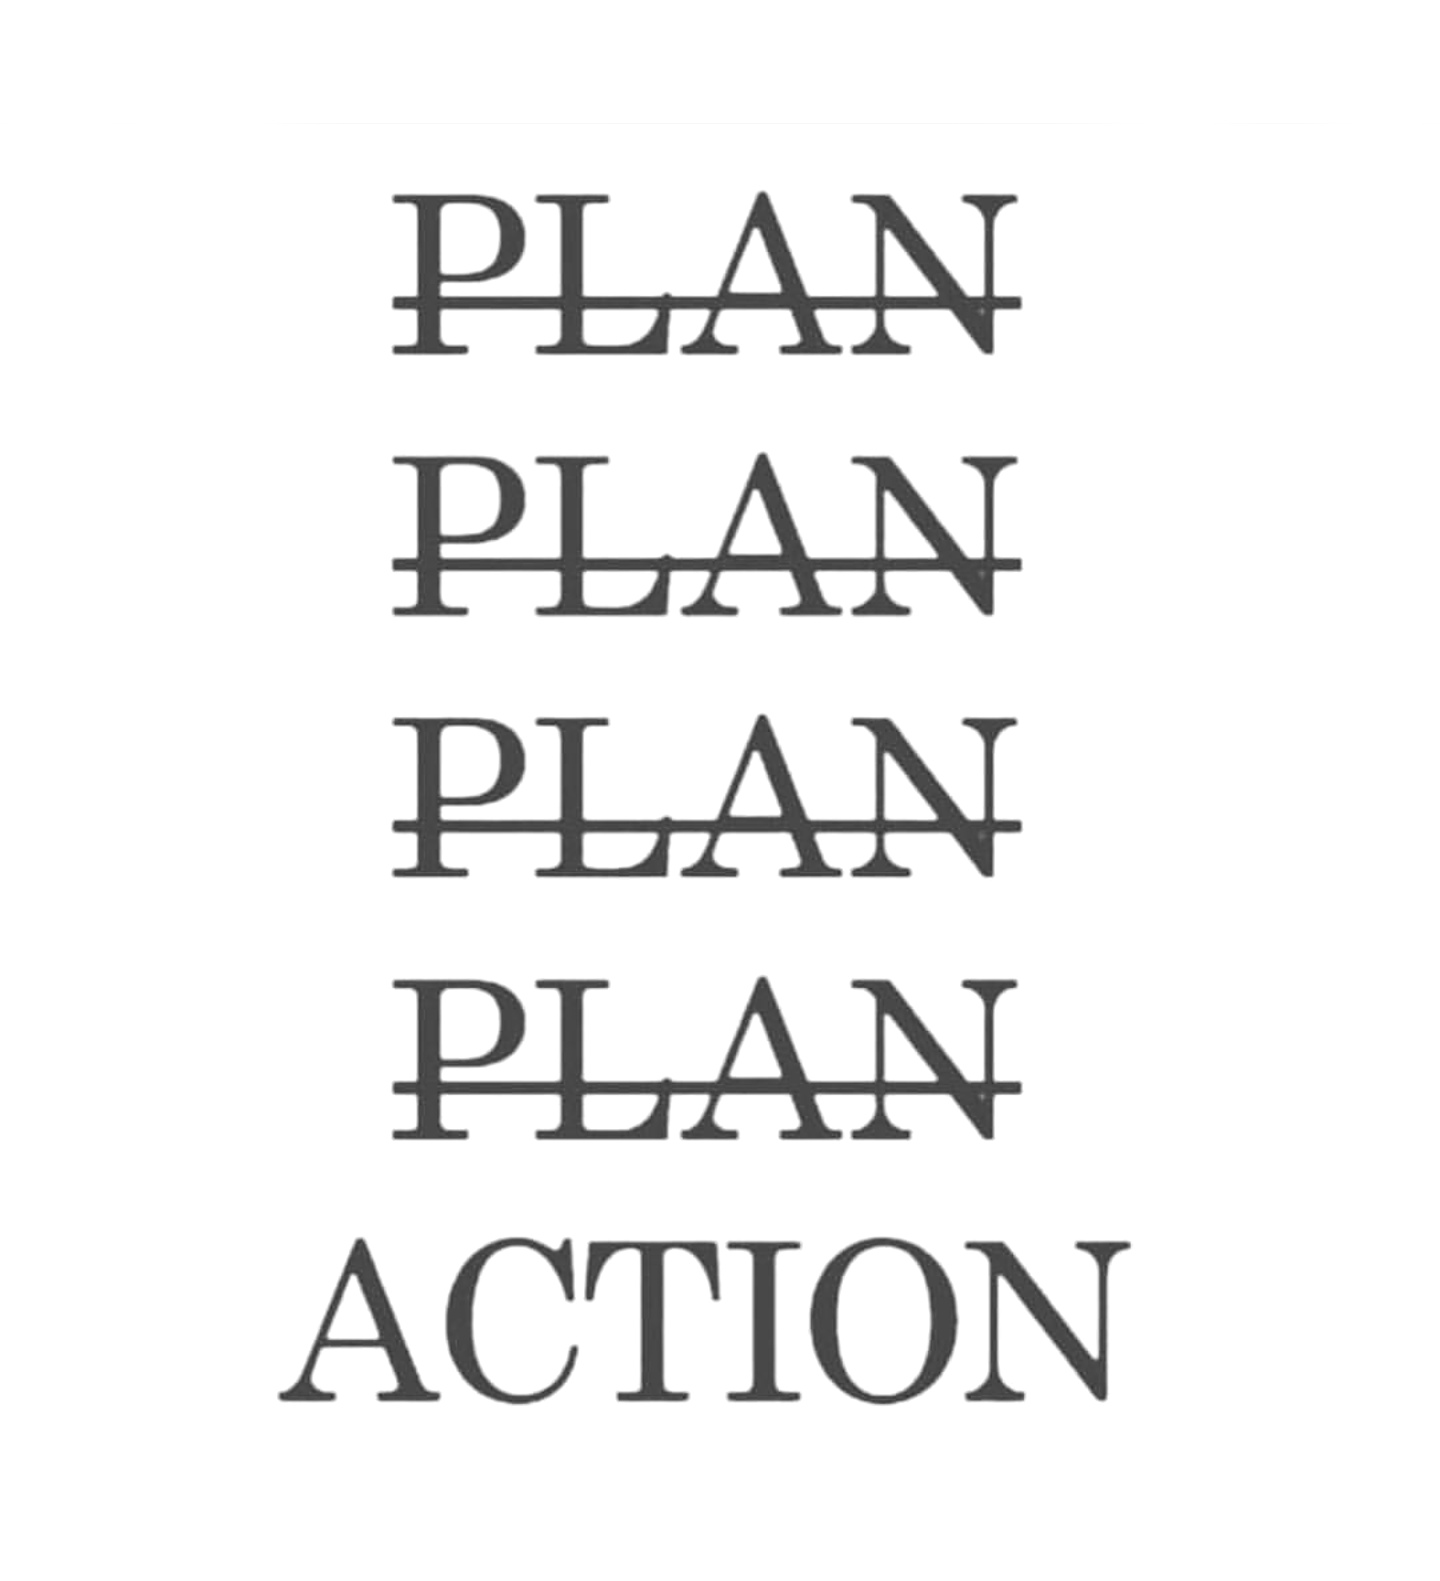 Just Do It Quotes Business Plan • Action • Motivation • Entrepreneur Quotes